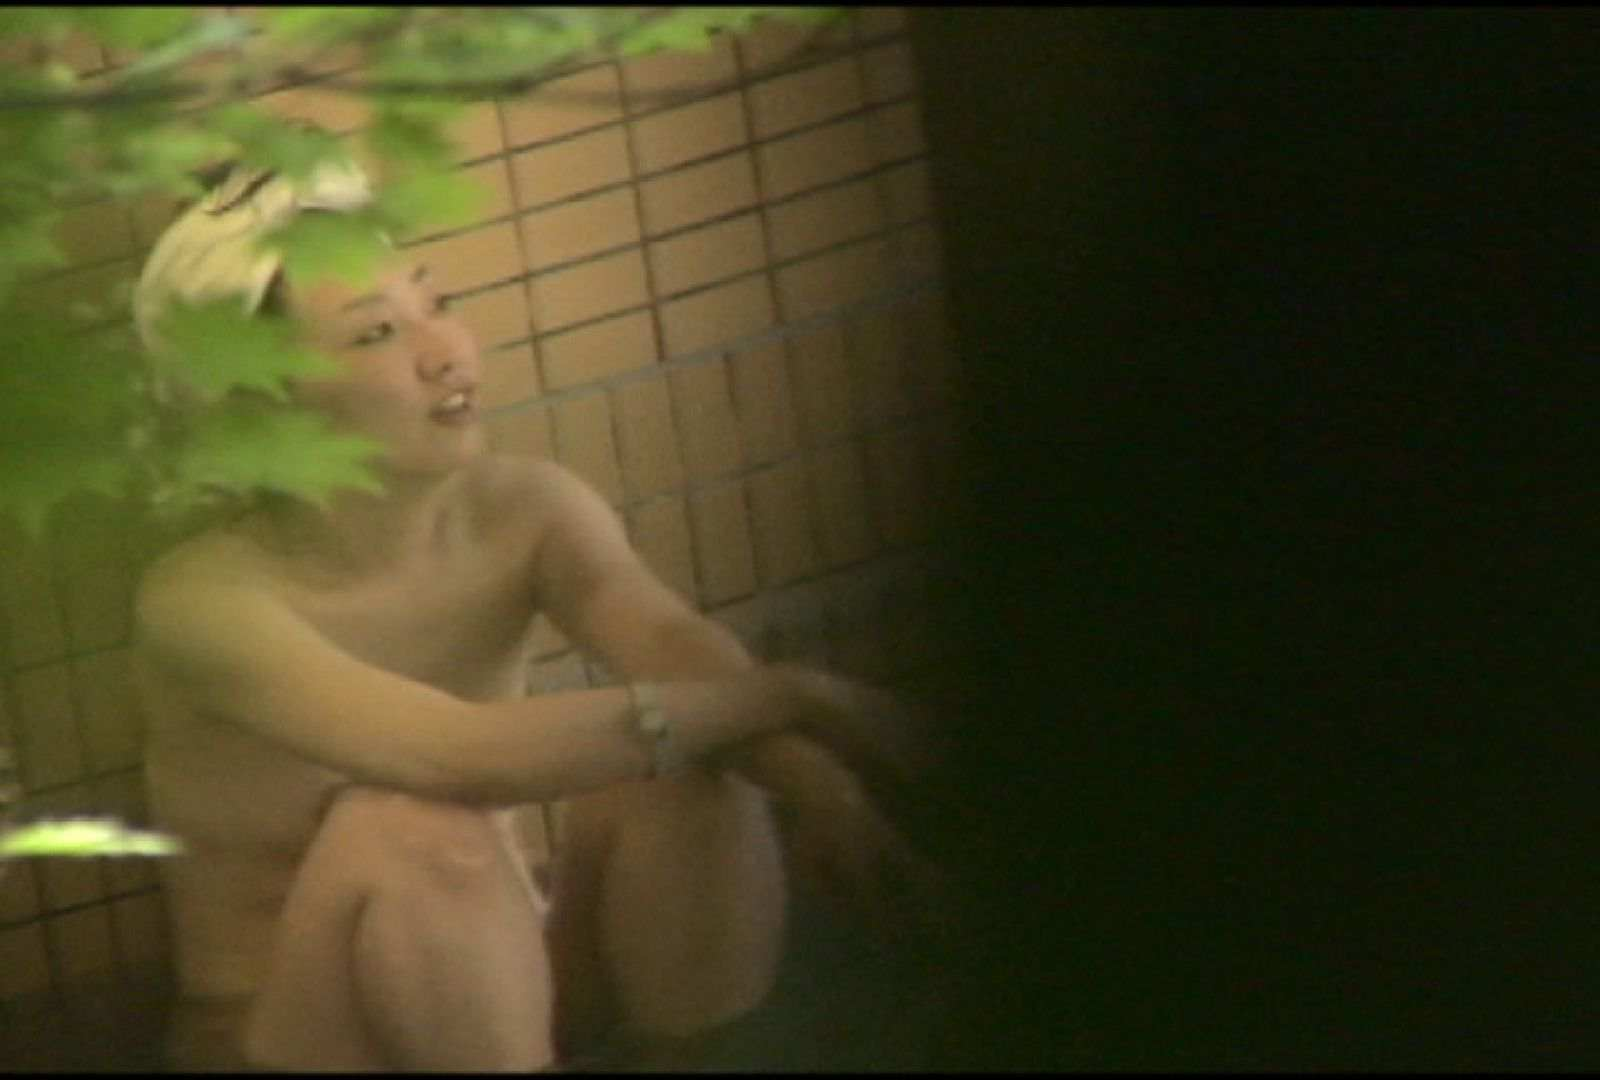 No.5 イイ笑顔ですねぇ、もう少しで割れ目さん見えたのに・・・ 美肌 セックス無修正動画無料 82枚 81